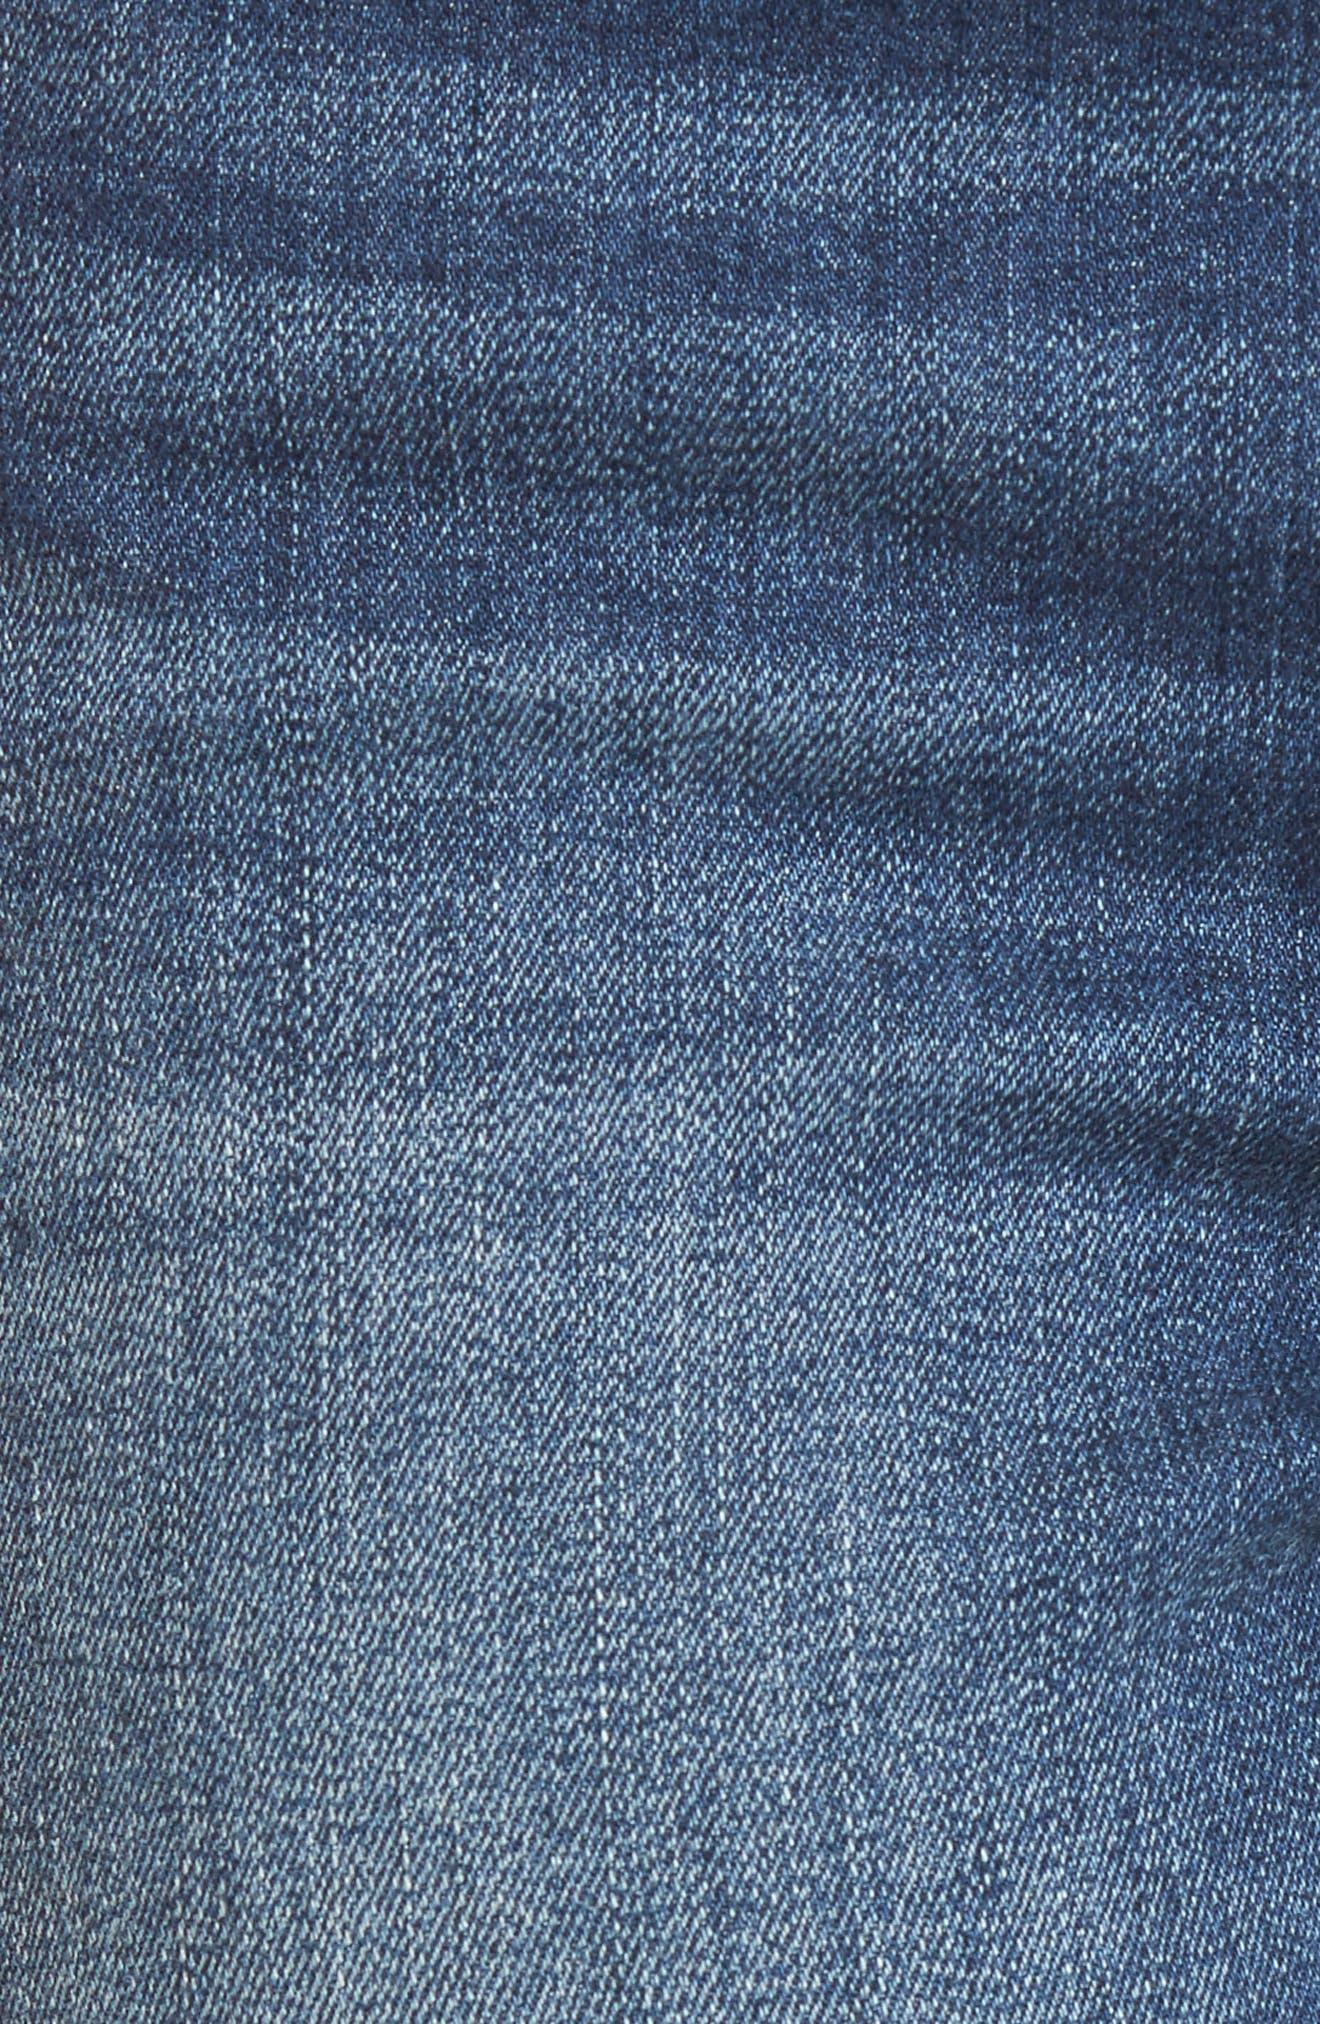 Pierced Hem Skinny Jeans,                             Alternate thumbnail 6, color,                             Medium Wash